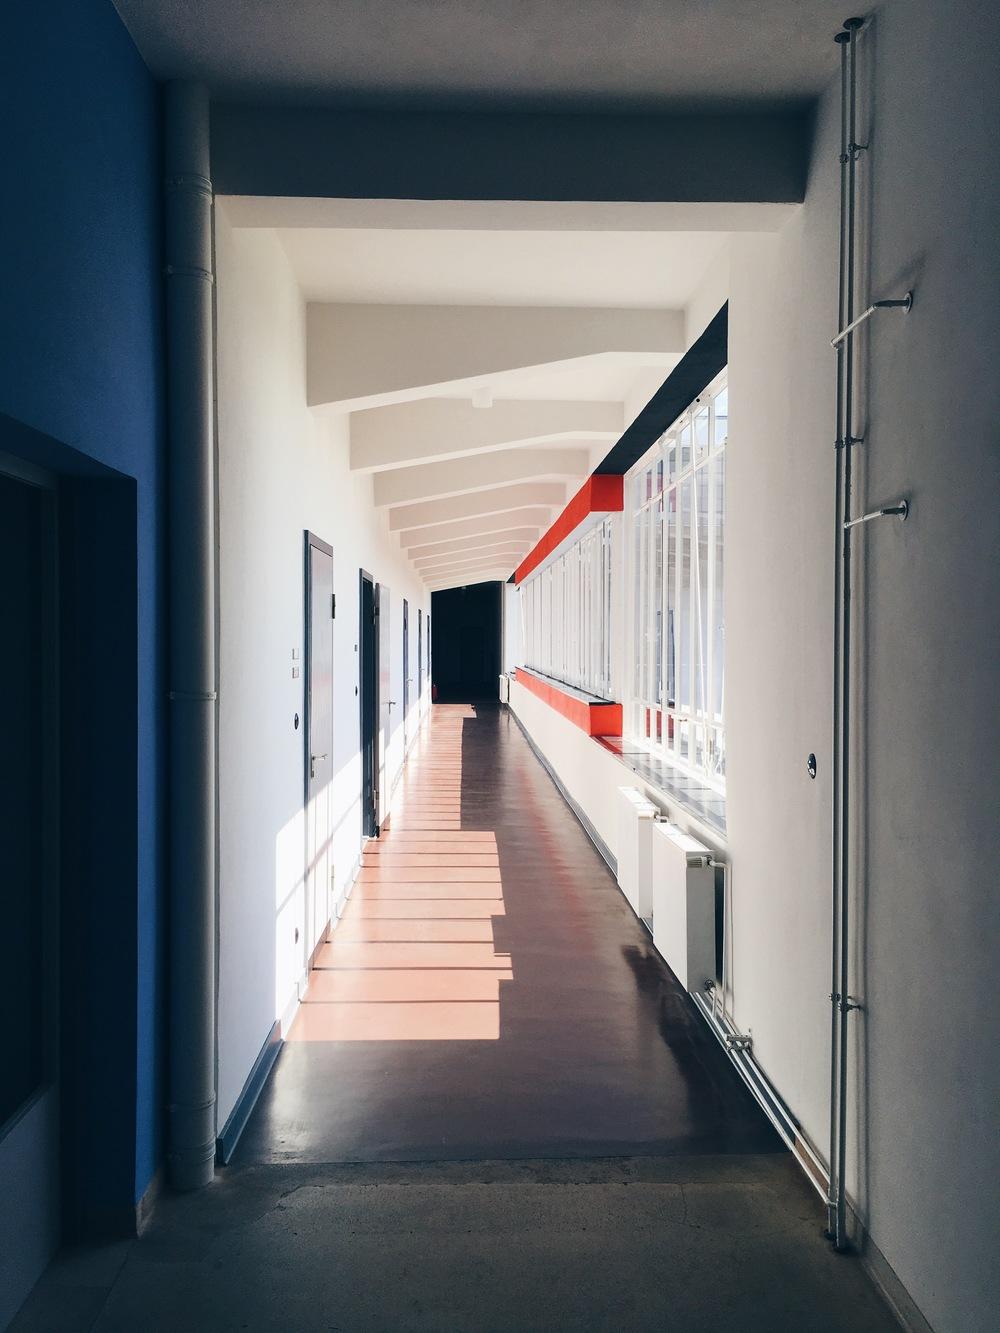 Korridor i  Bauhausskolan, sommaren 2016.